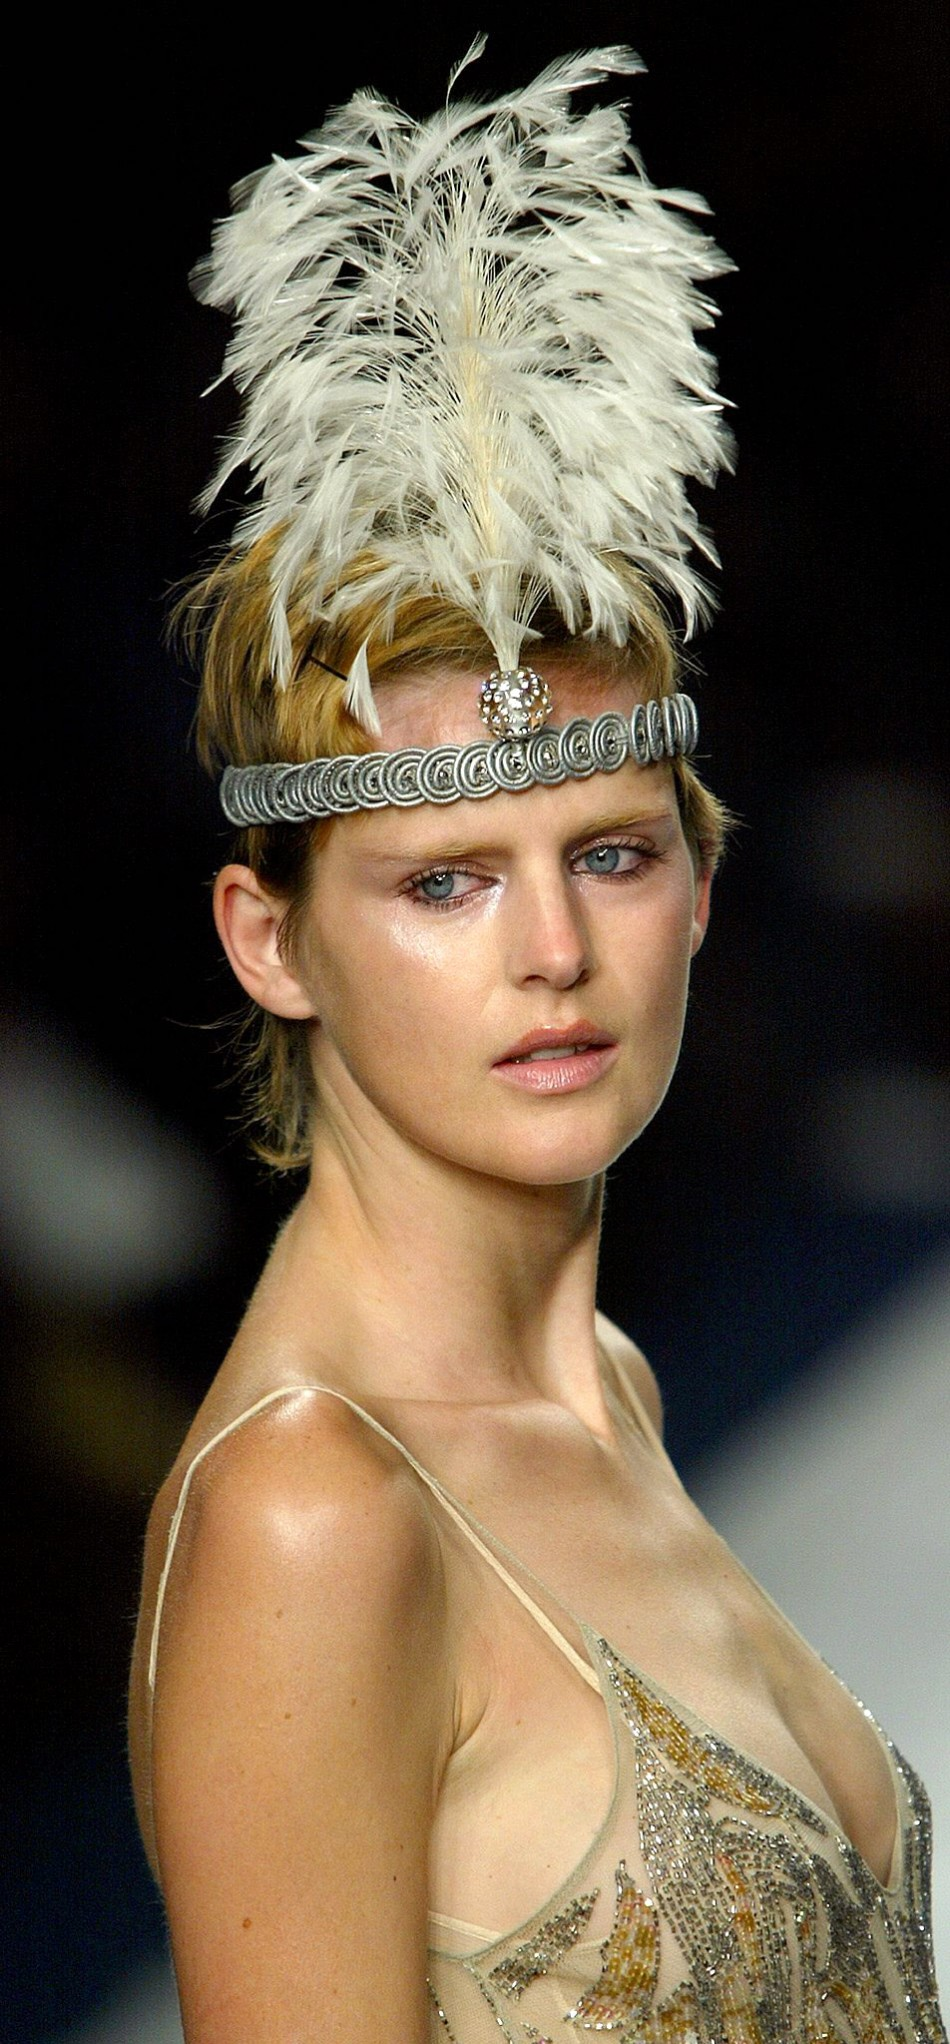 British Fashion Awards 2011 Model - Stella Tennant